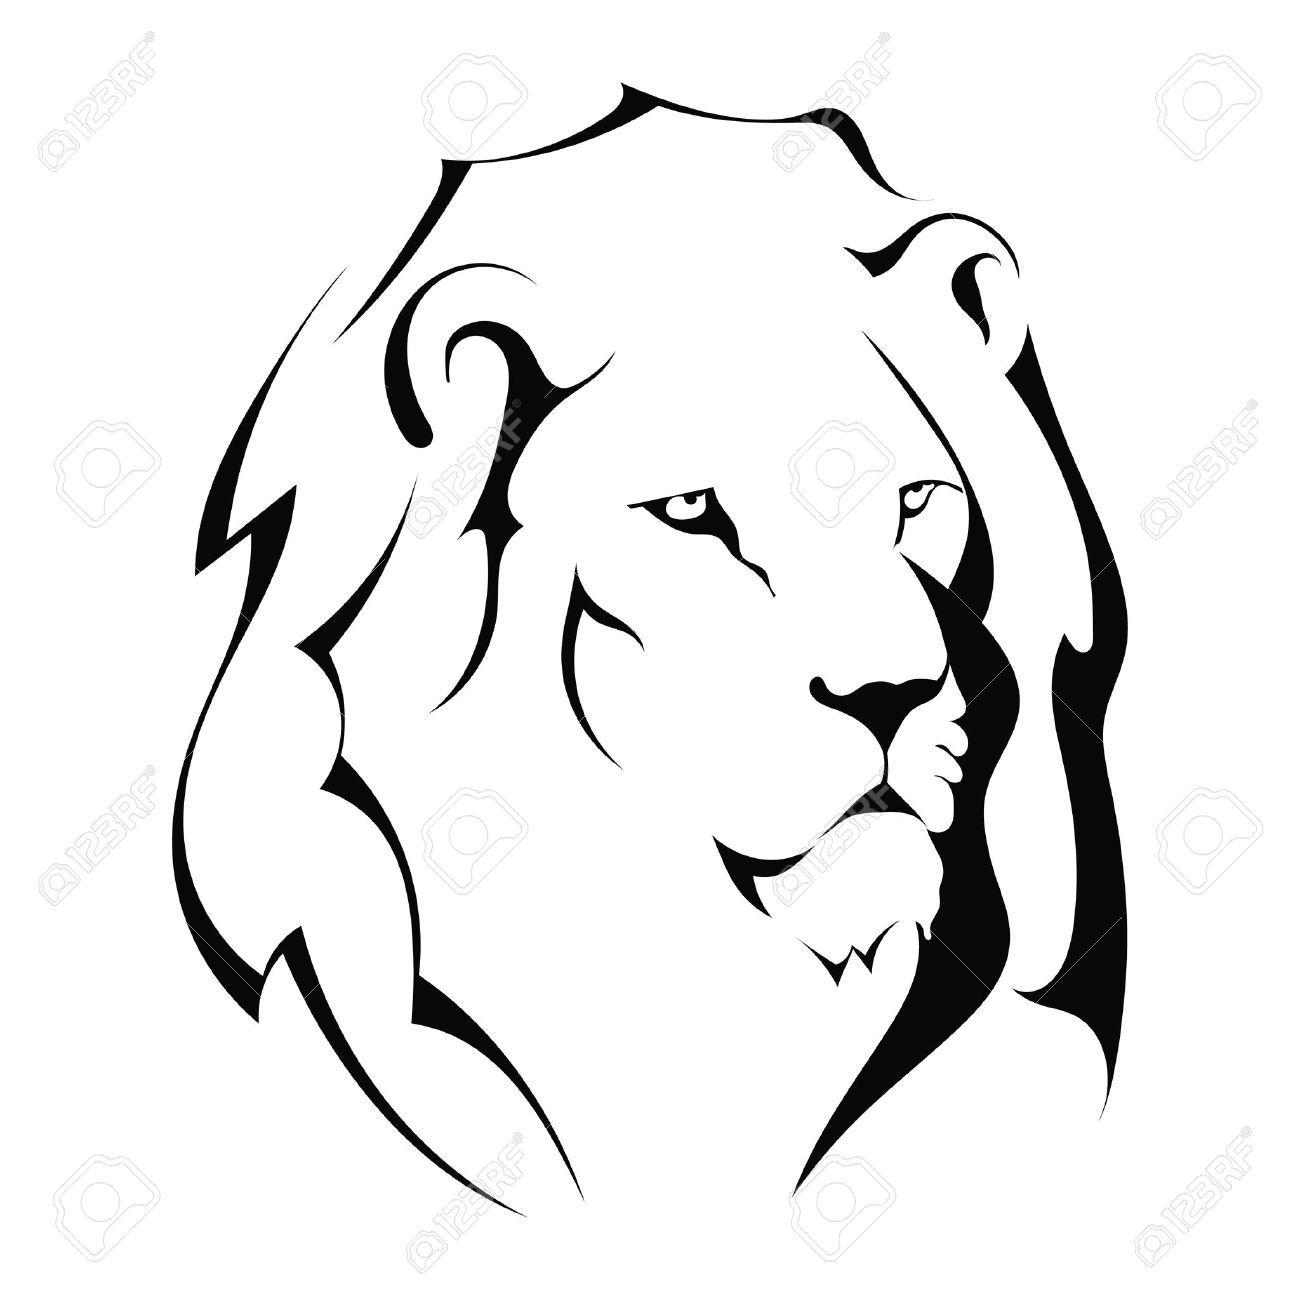 Clipart 25248037 lion head on a white